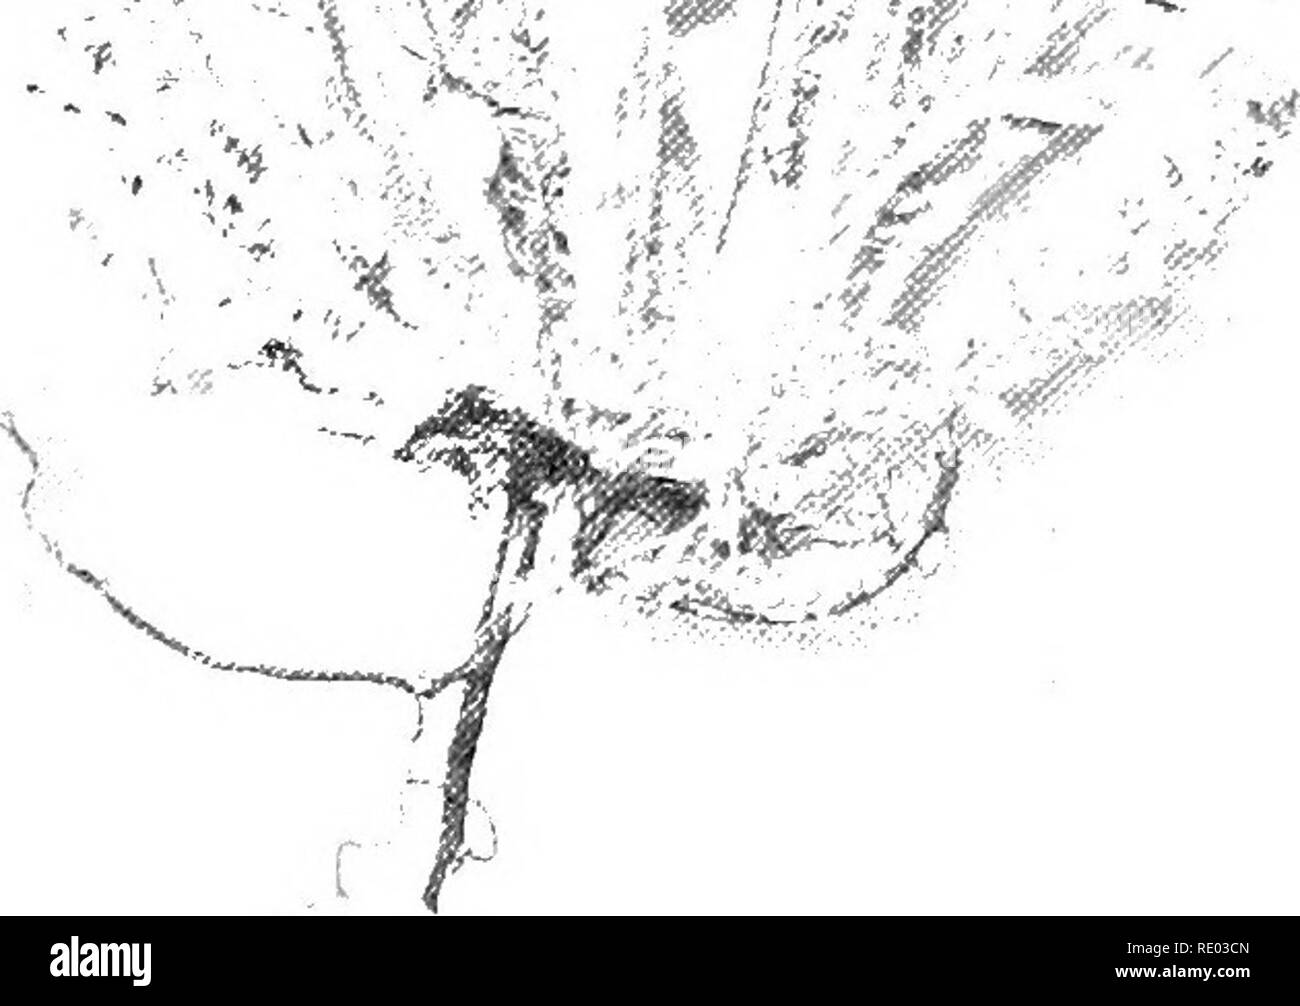 I 90 Black and White Stock Photos & Images - Alamy